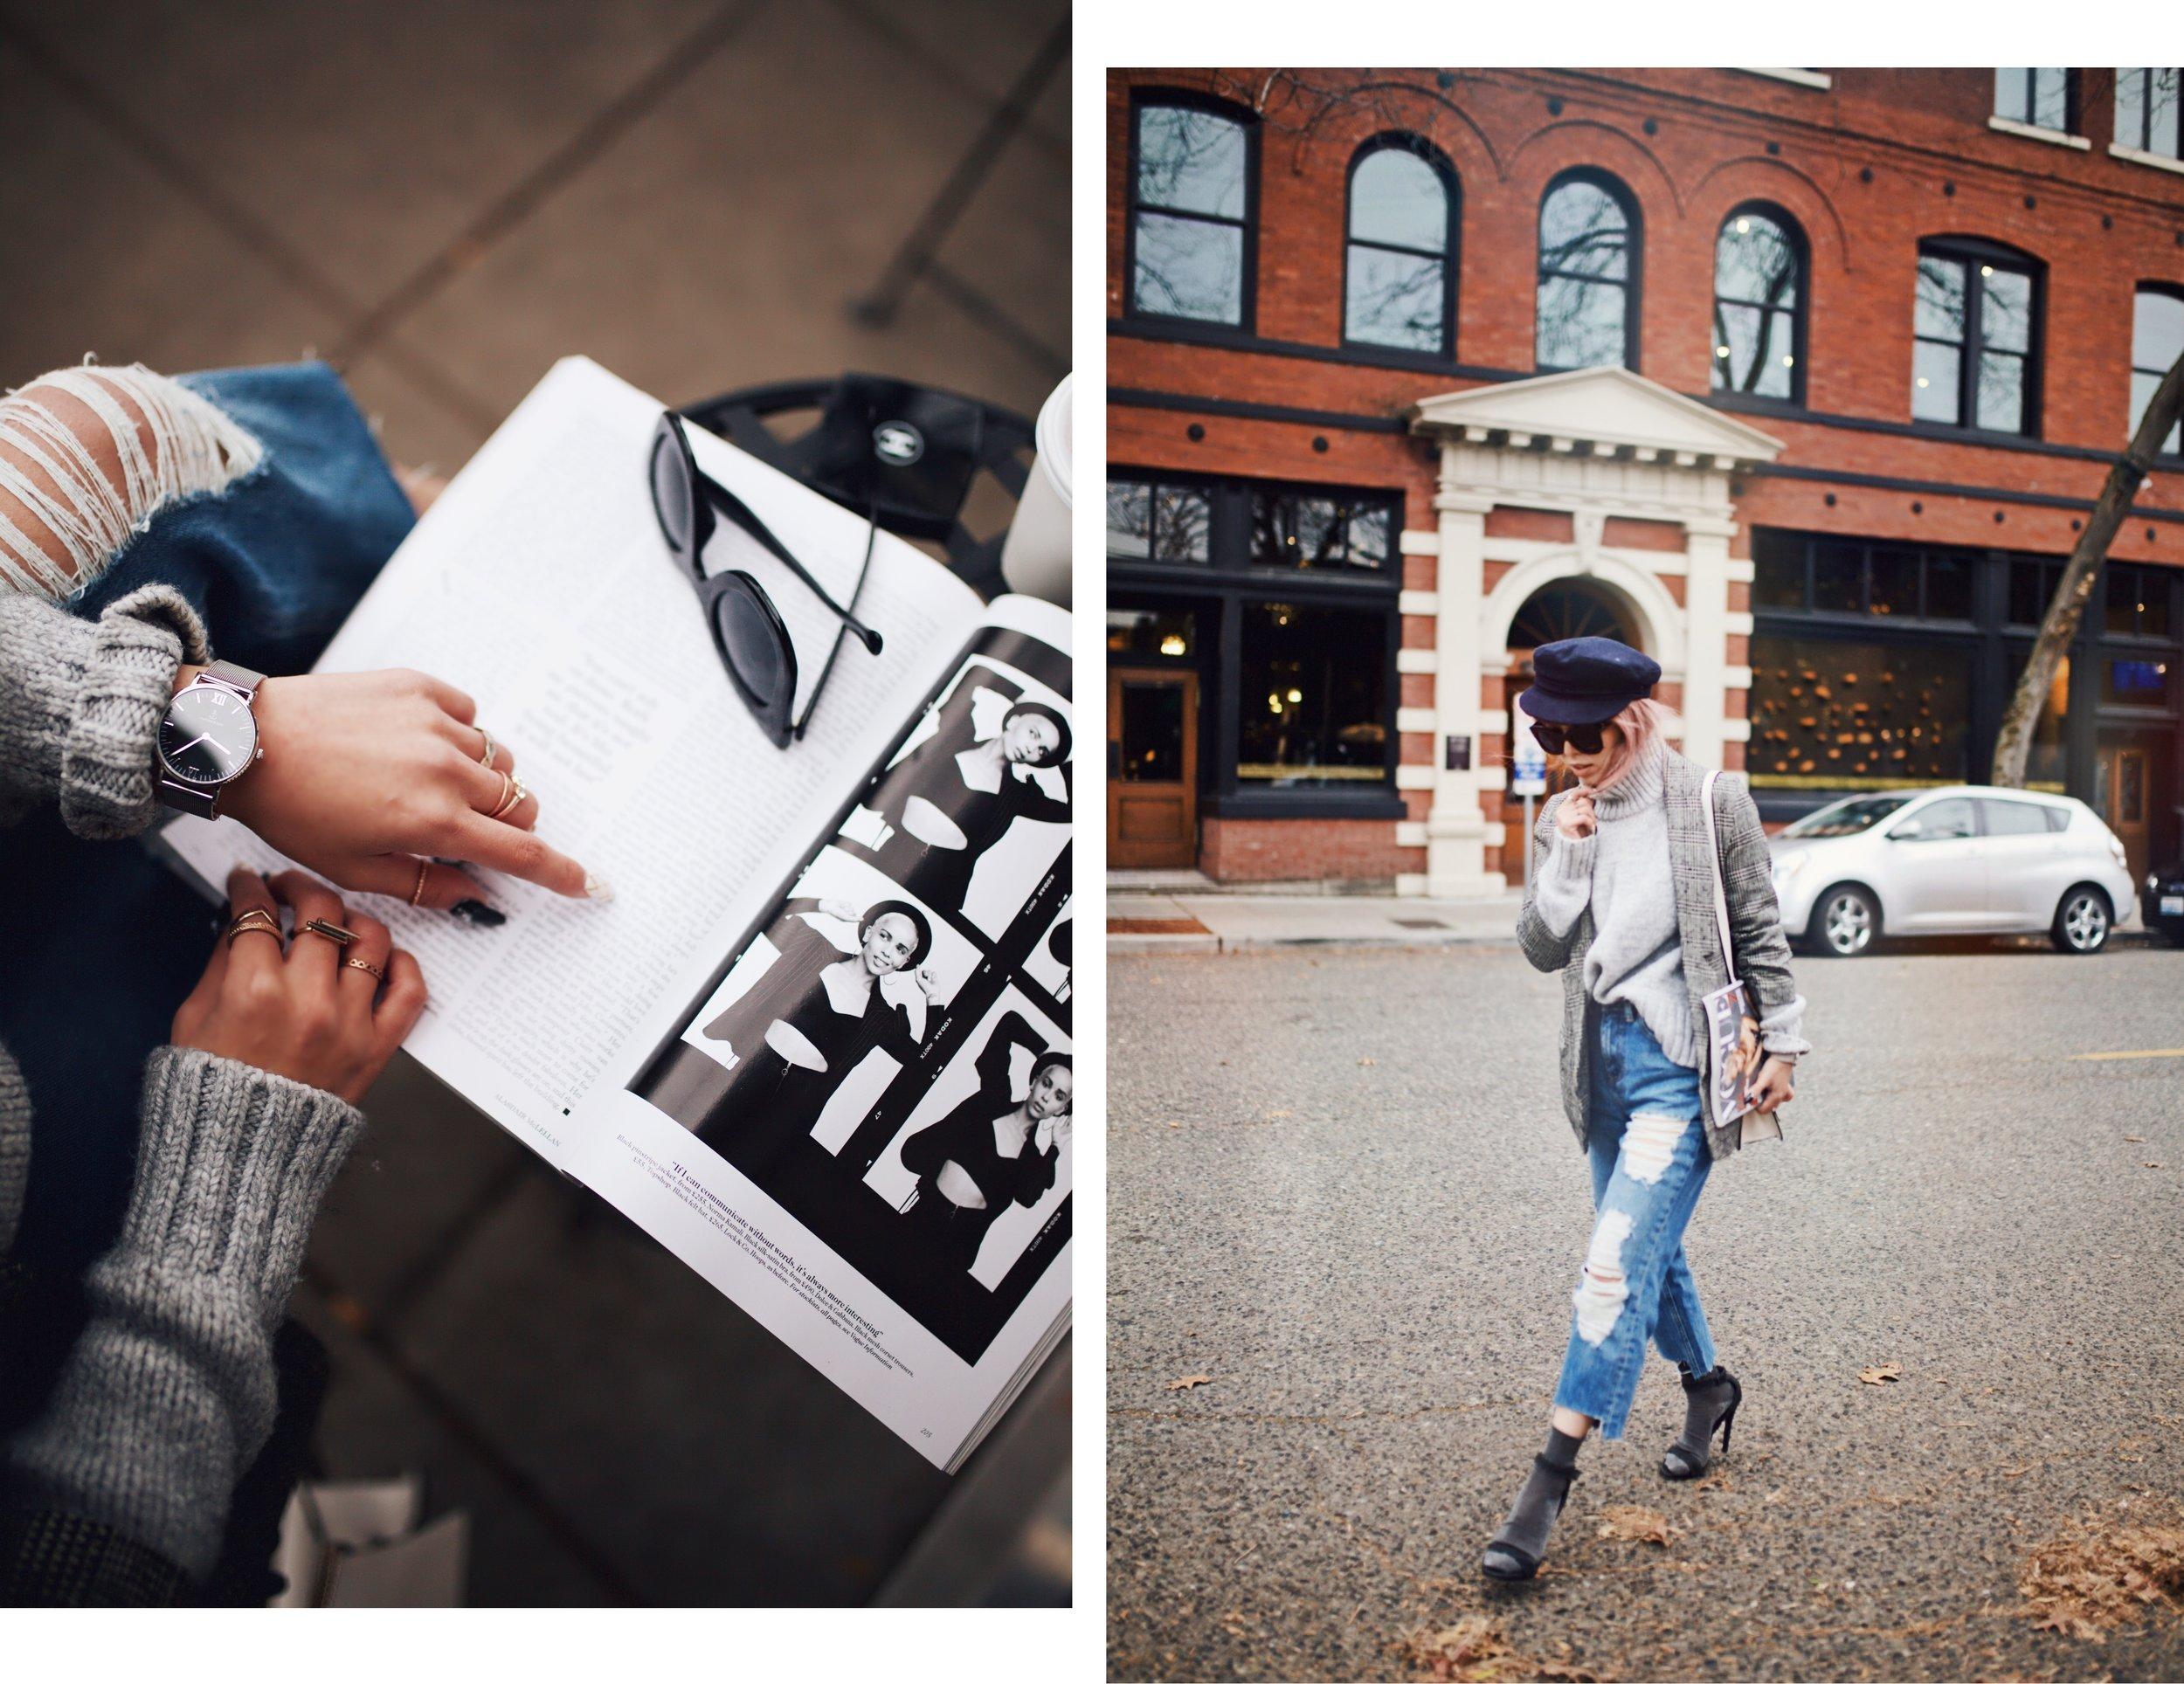 Zara Gray Turtleneck Sweater-Nordstrom Checked Blazer-ASOS Distressed frayed hem jeans-NAIGAI Glitter Ankle Socks-Black scrappy sandals-H&M White Crossbody Bag-Aritzia Fisherman Hat-Aika's Love Closet-Seattle fashion style blogger-pink hair-Japanese 5